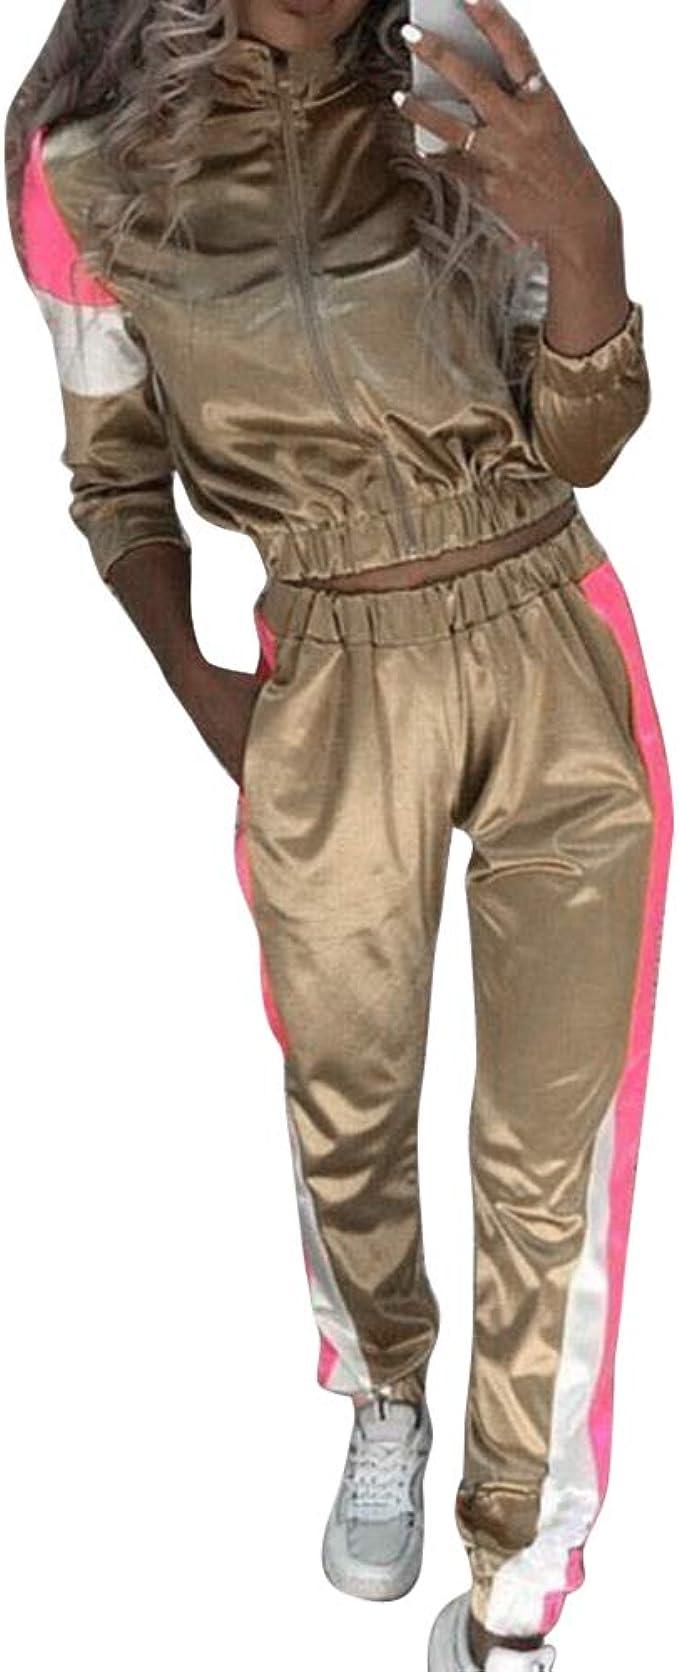 Unifizz Damen Jumpsuit Jogger Jogging Sport Trainingsanzug Overall Freizeitanzug Sportanzug 2 St/ück Outfits Pullover Hoodie Frauen Sweatpants Set